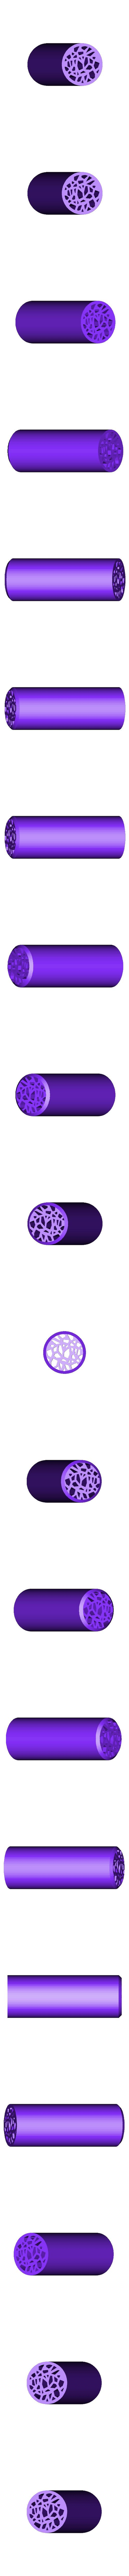 Filtro tex4.stl Download STL file FILTER TIPS - 89 FILTERS- ALL PACKS - WEED FILTER • 3D printer model, Weed420House